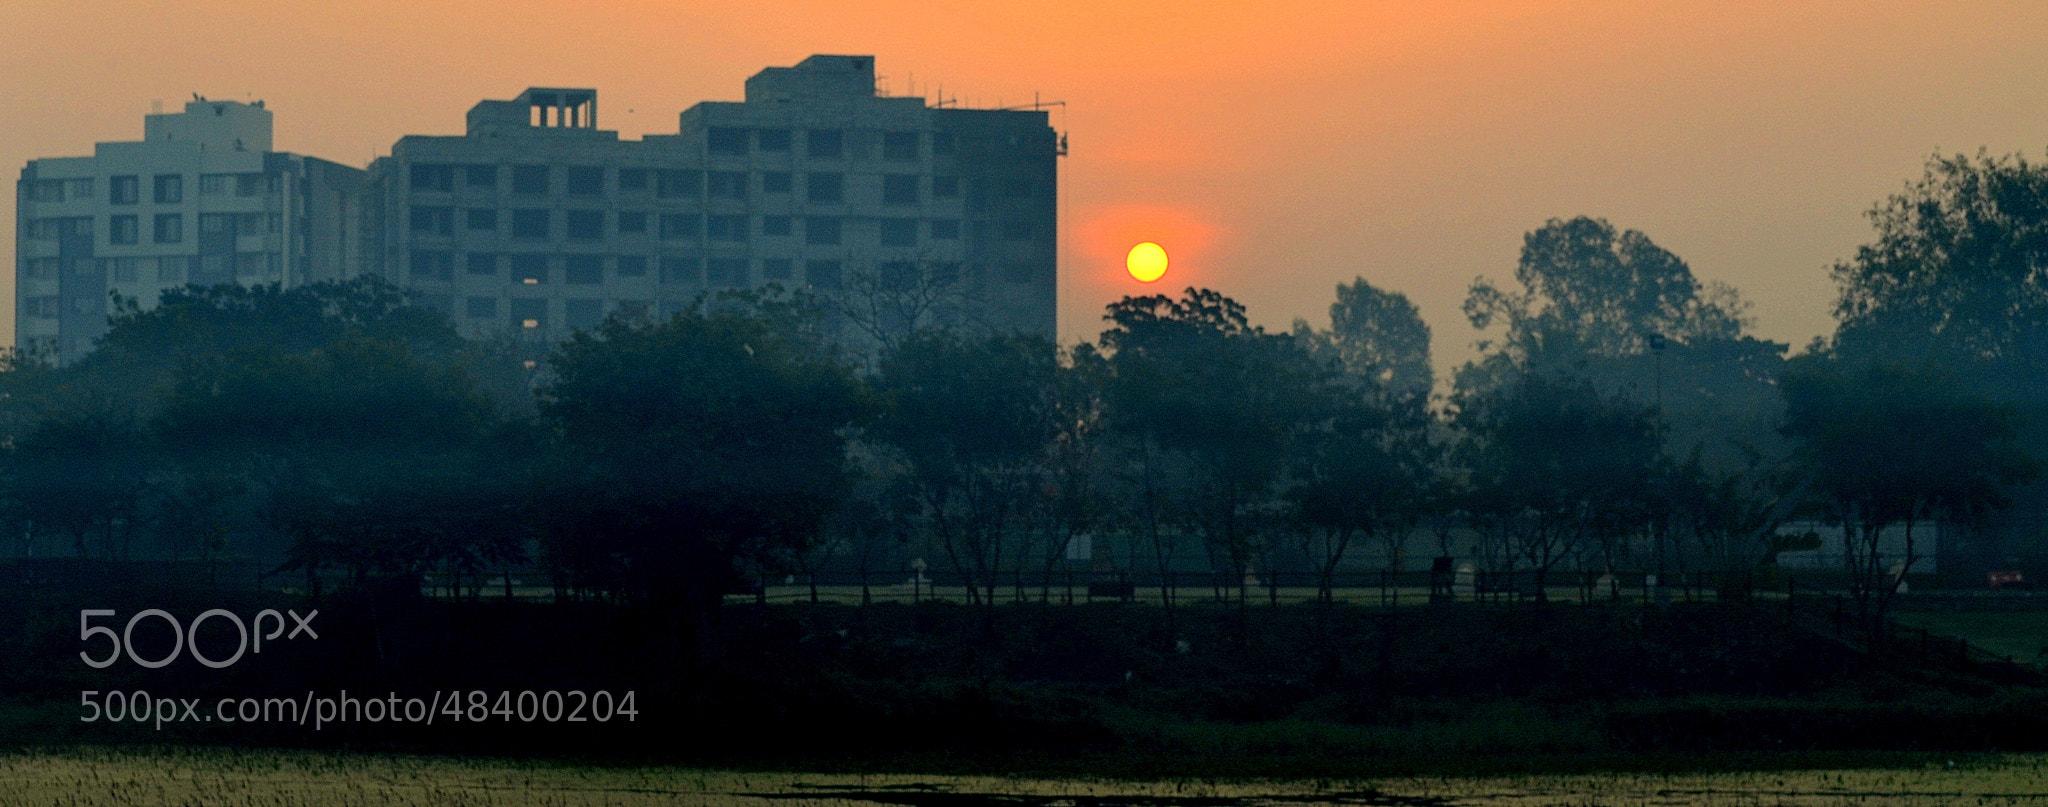 Photograph The Foggy Dawn. by Aaditya Kothari on 500px